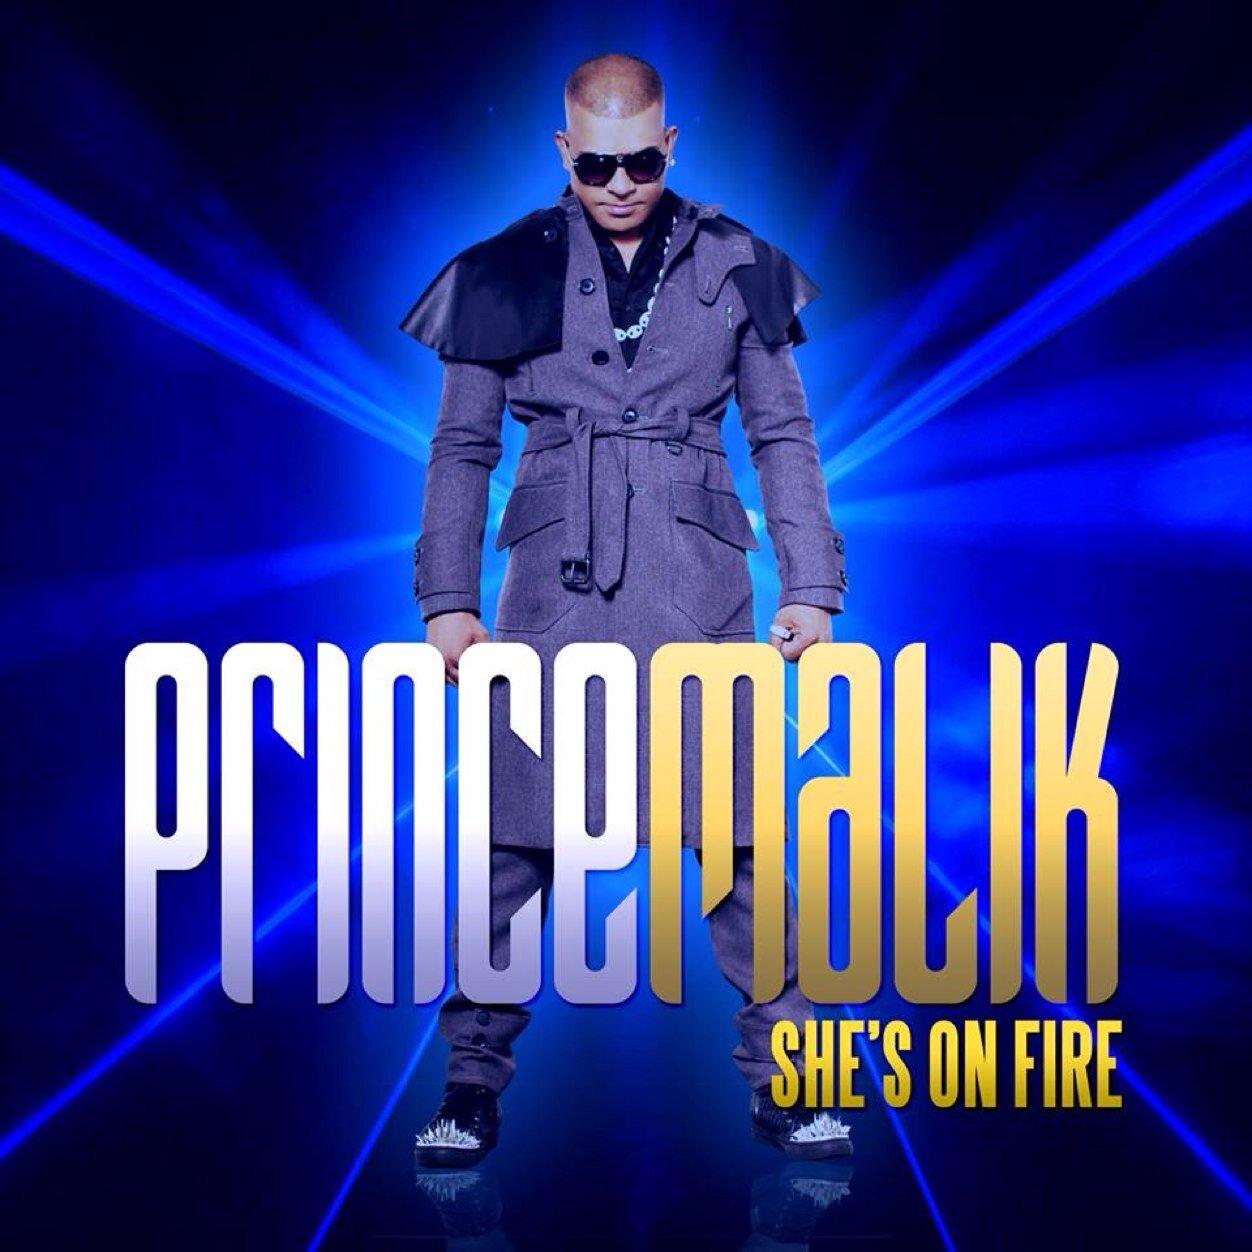 @PrinceMalik